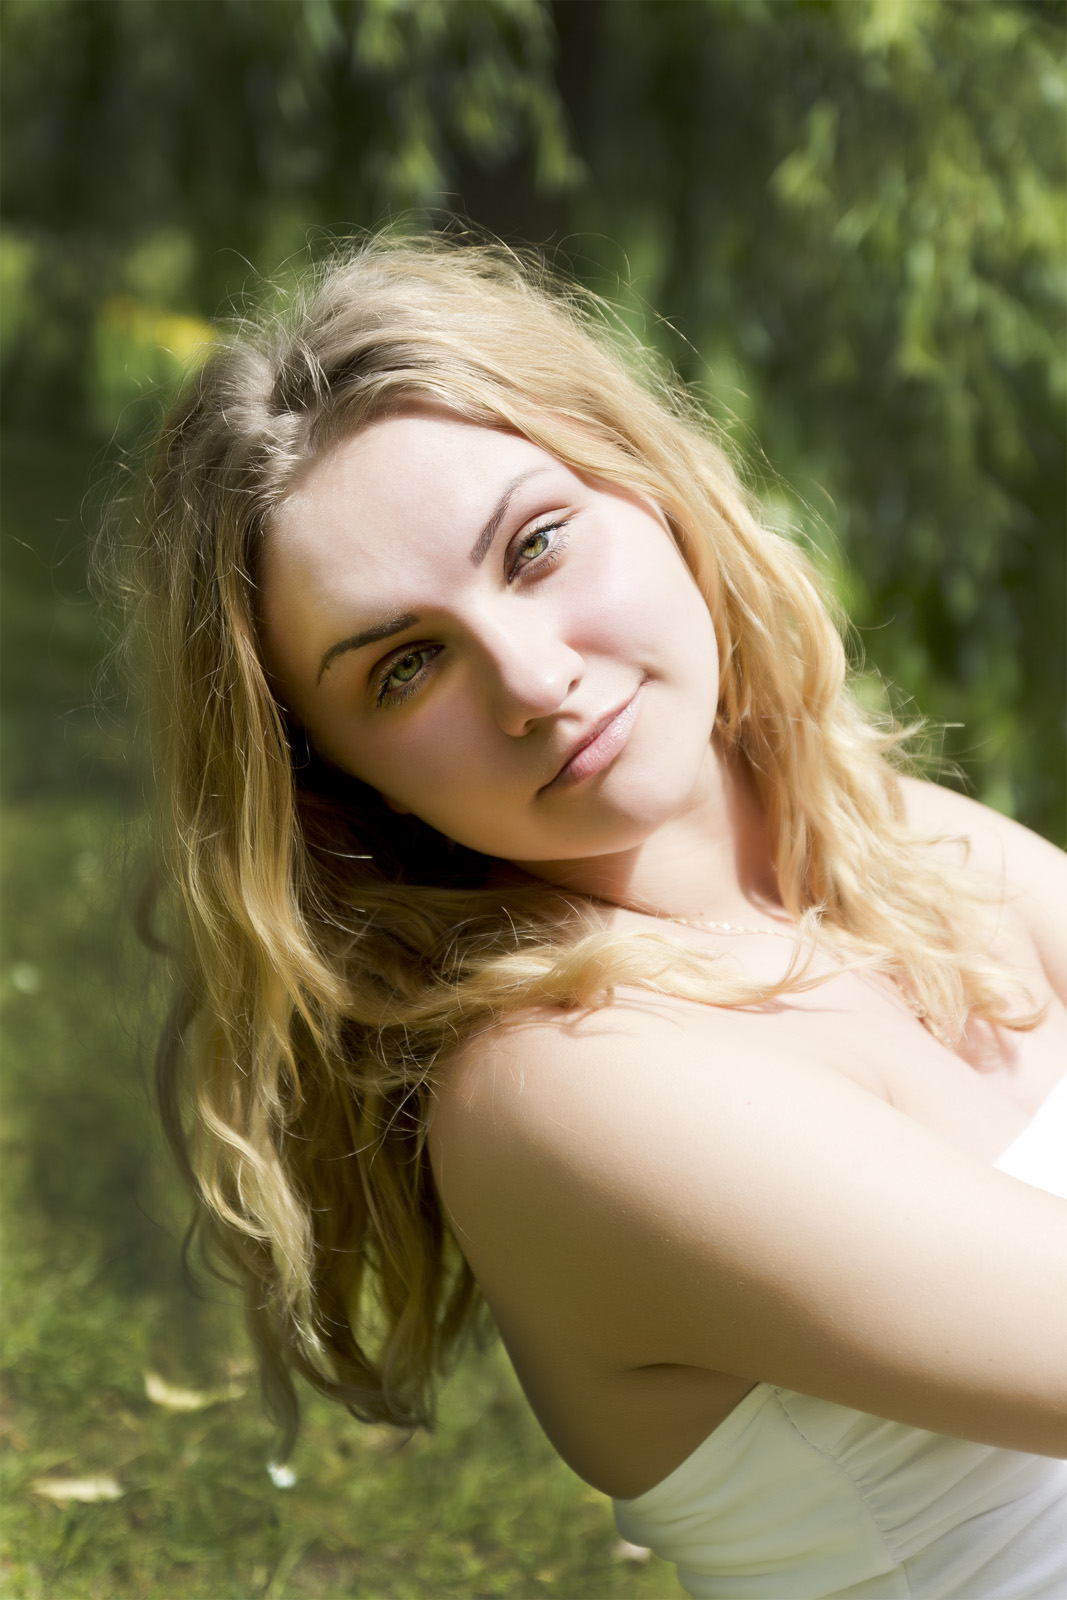 Olga Berlin